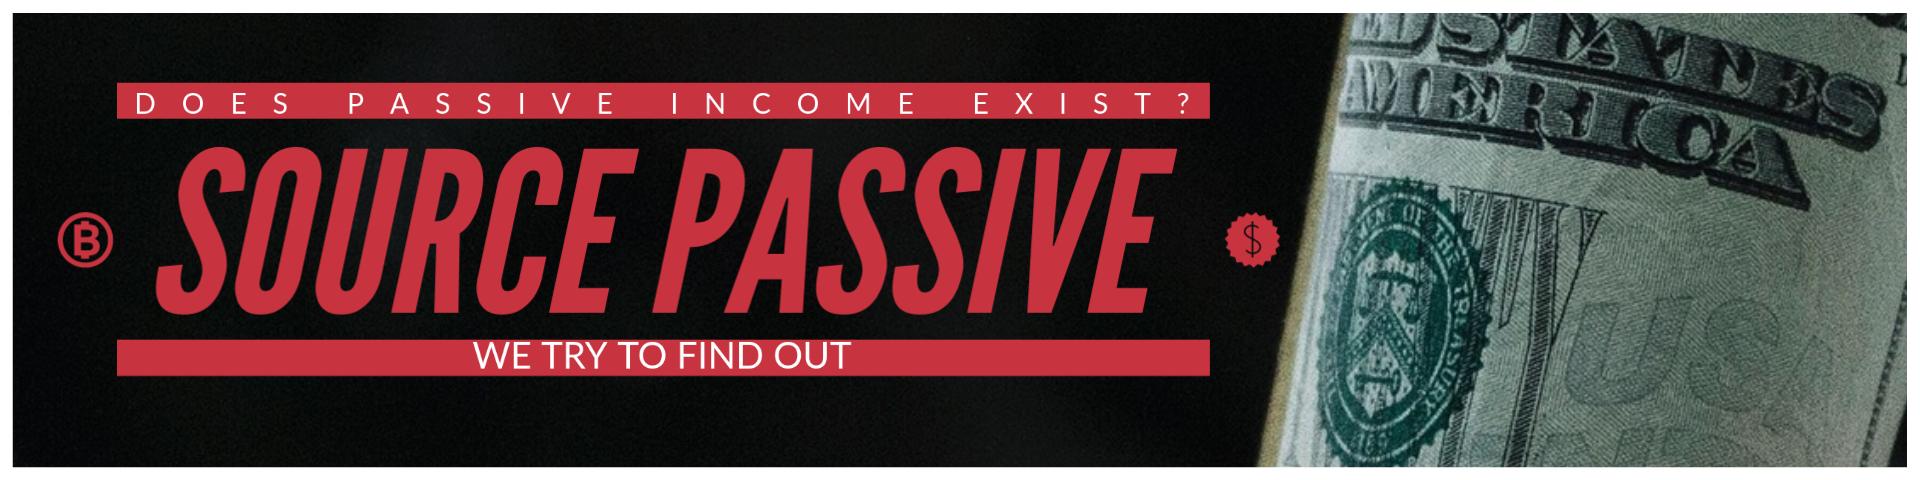 Source Passive